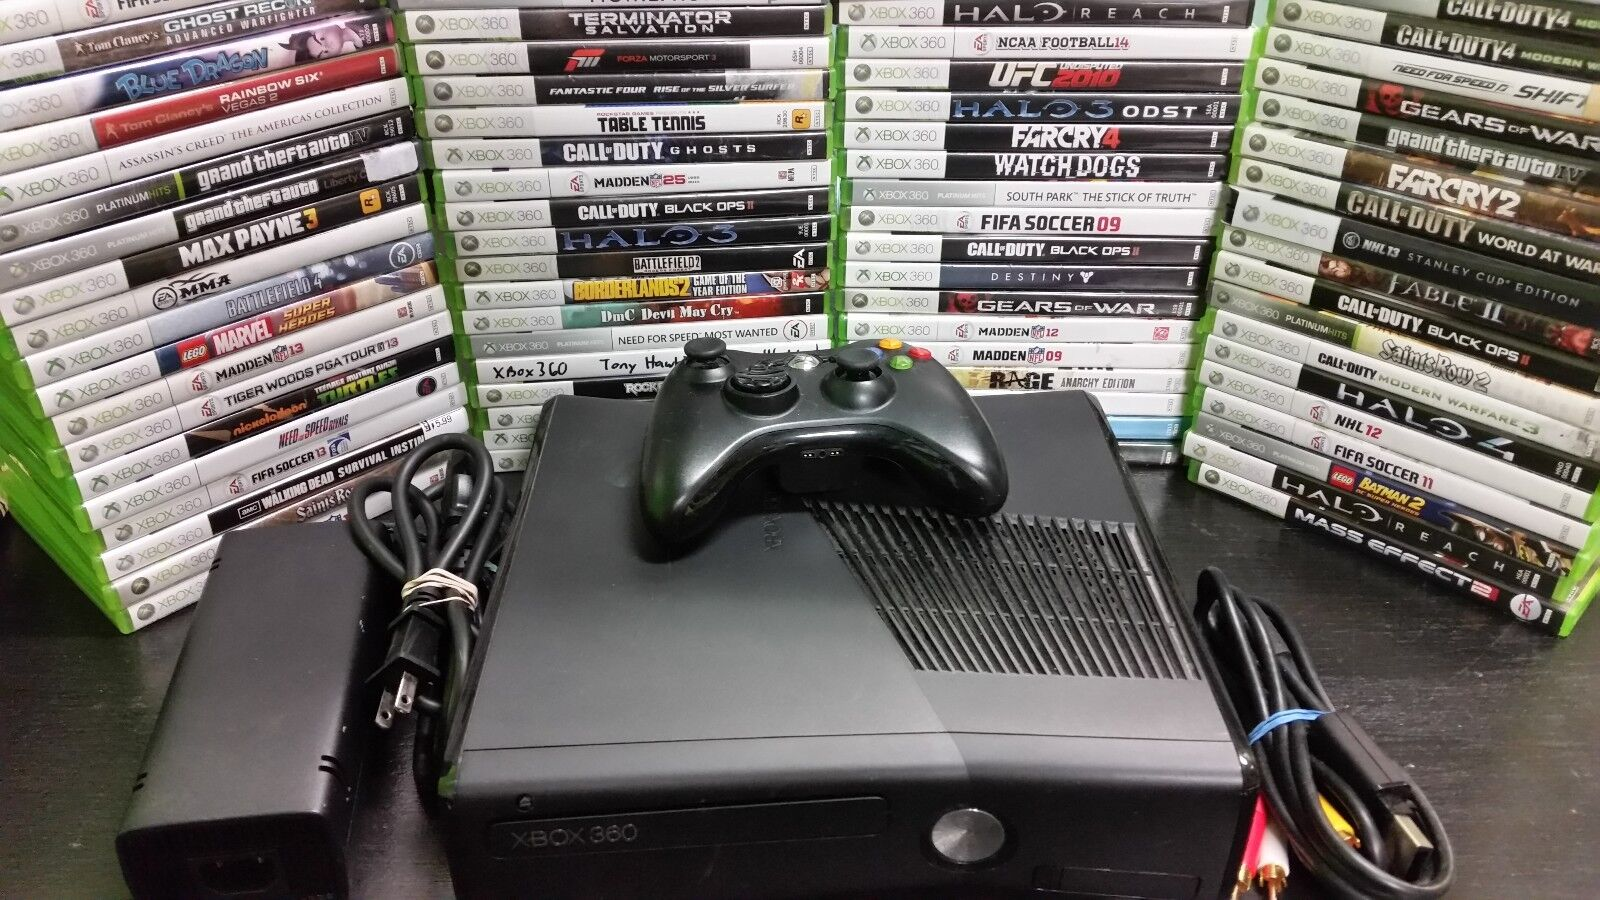 Xbox 360 - Microsoft Xbox 360 4gb, 250gb, 320gb system console with games